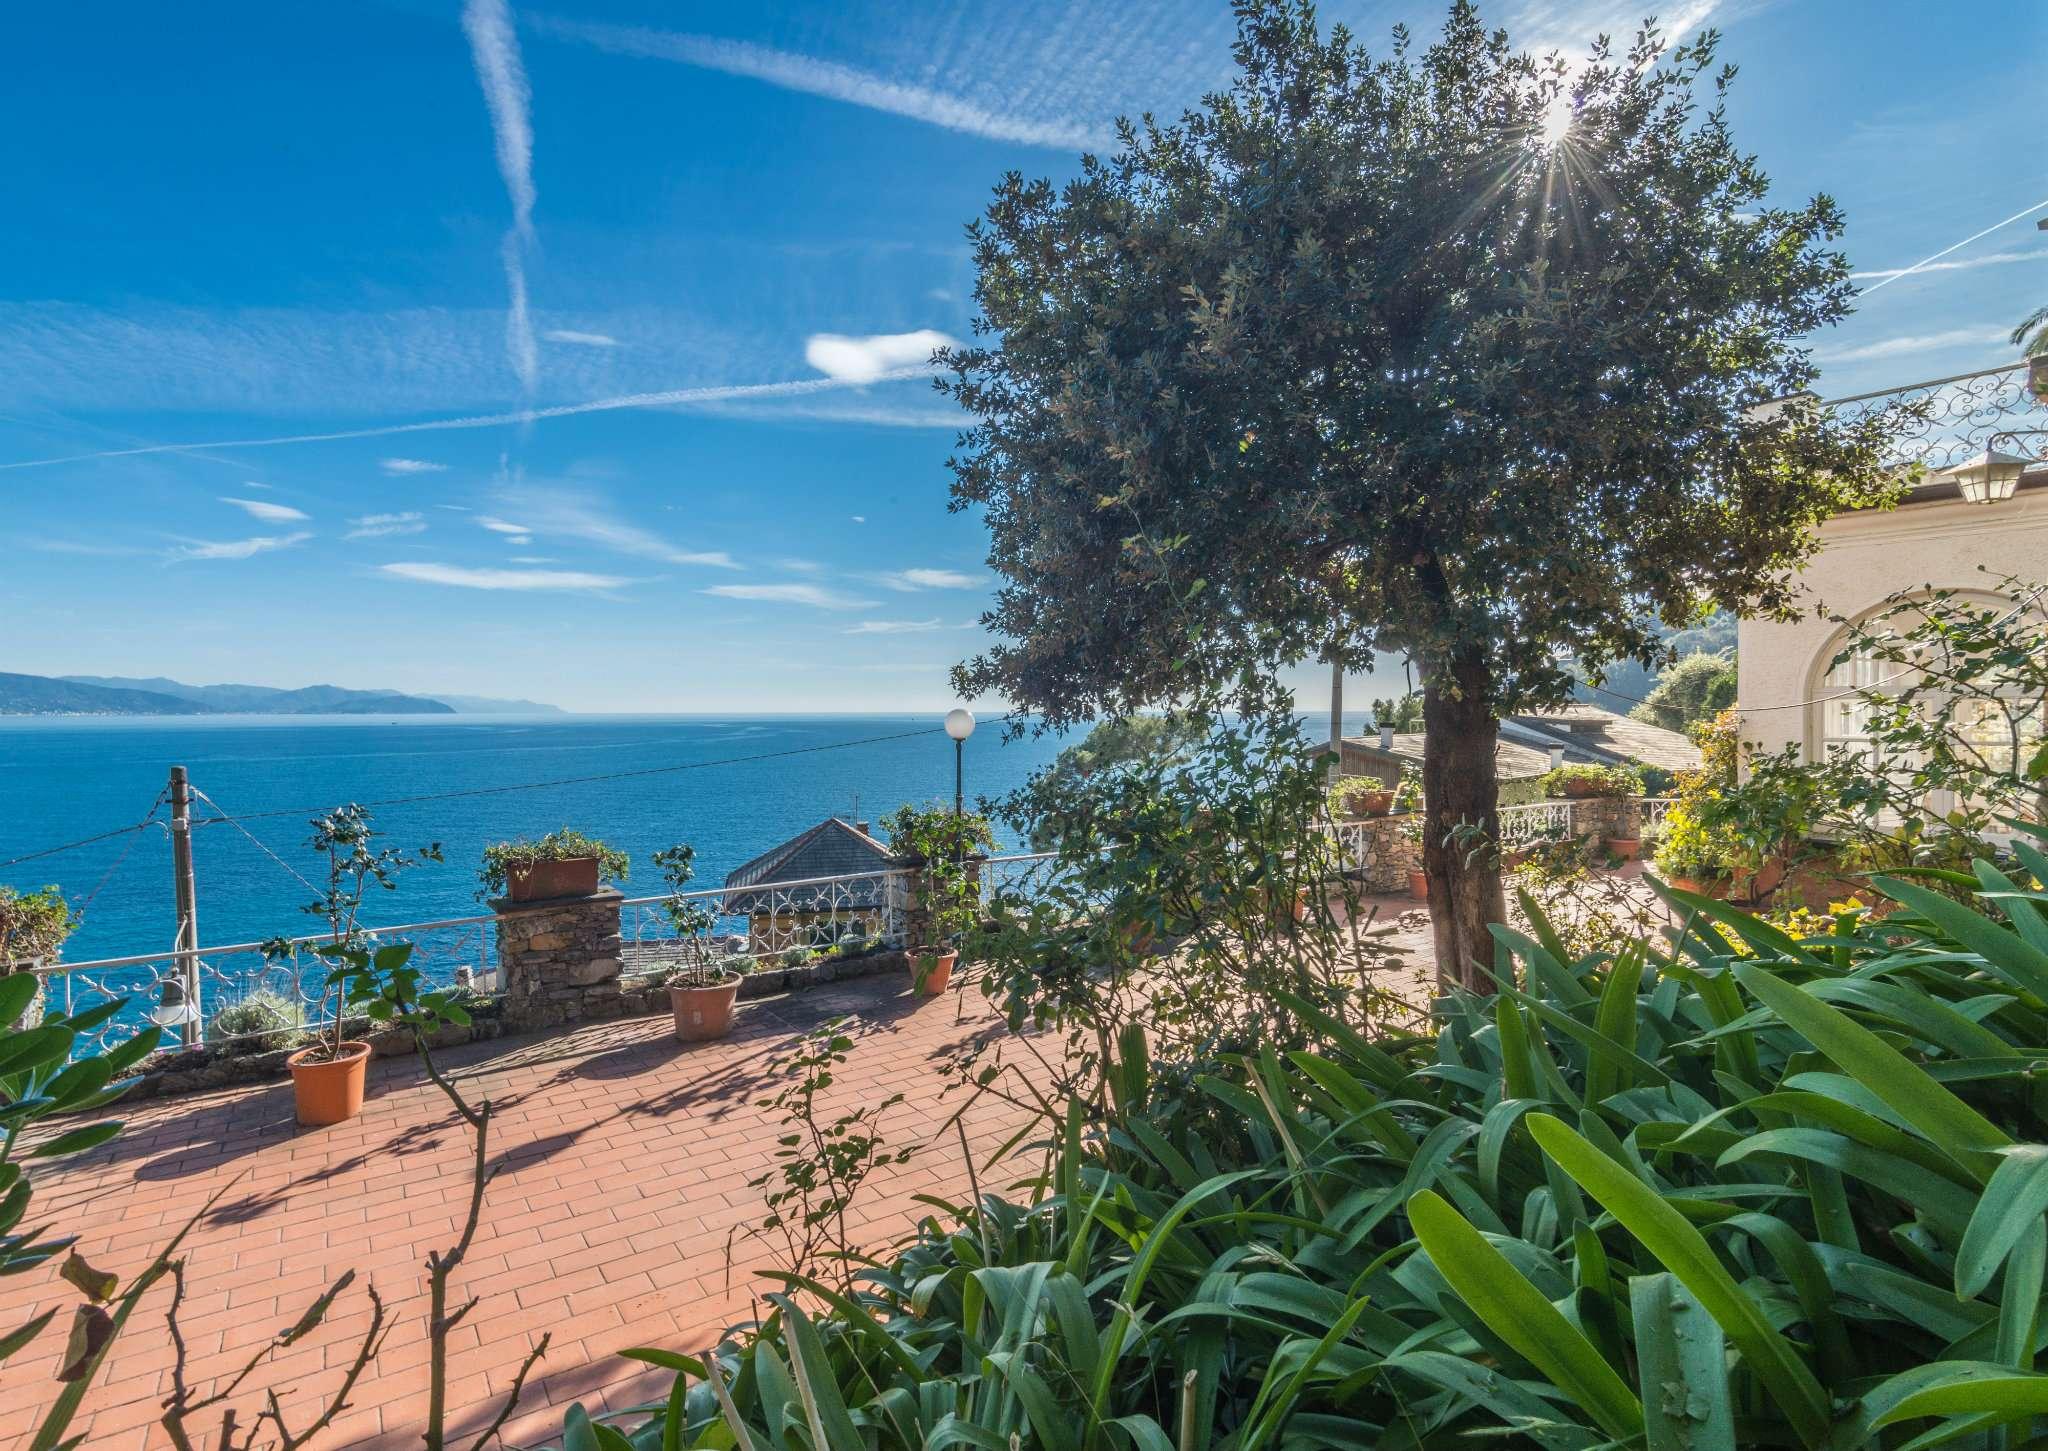 Villa in Vendita a Santa Margherita Ligure: 5 locali, 545 mq - Foto 18